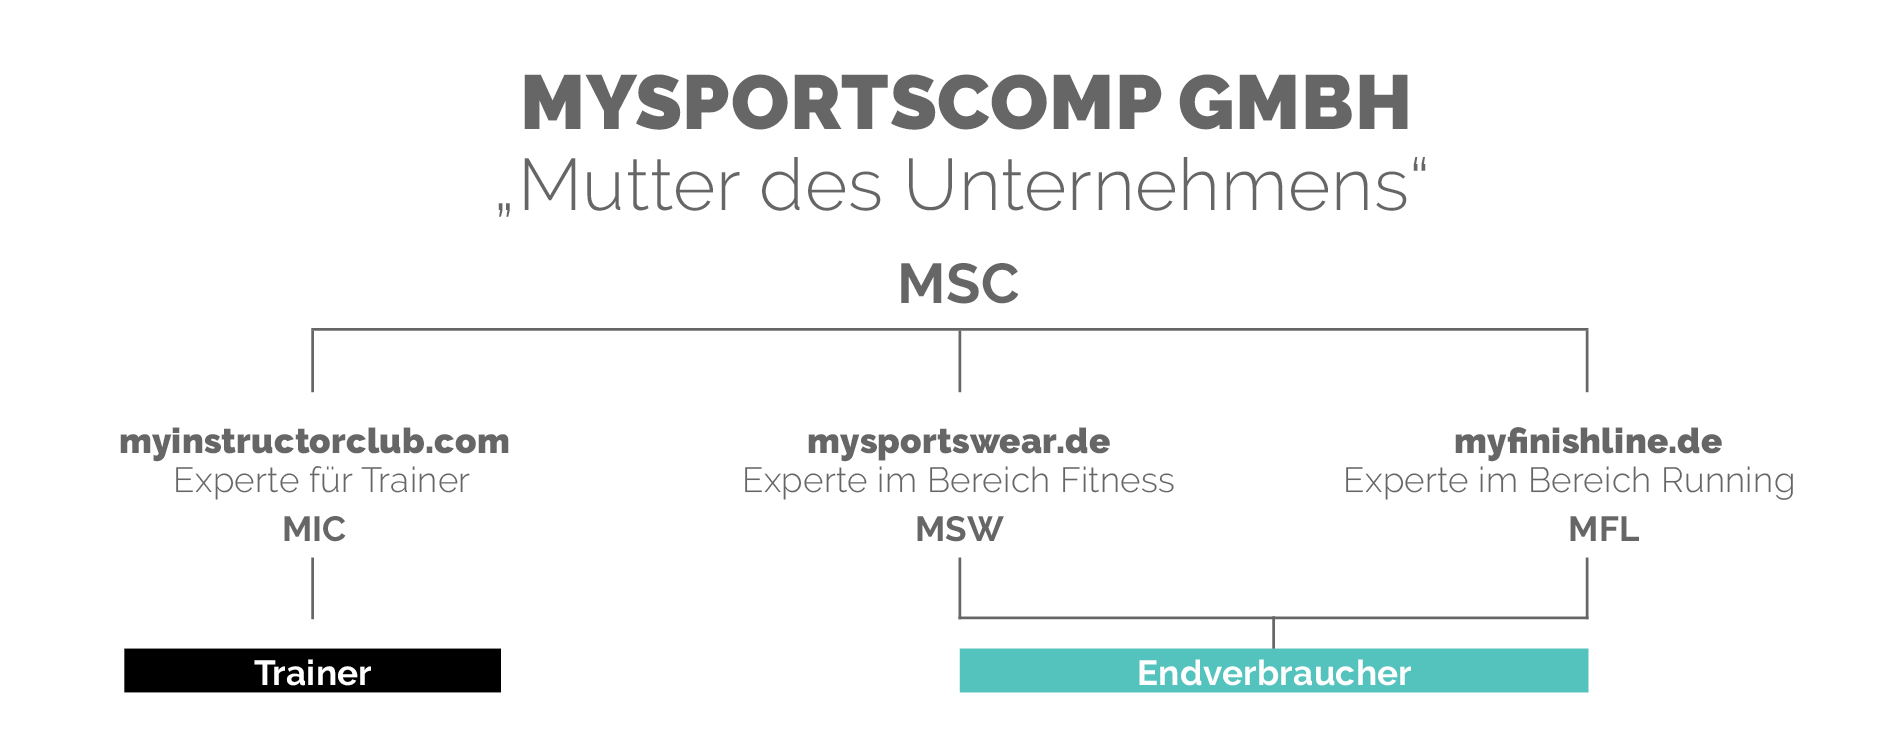 Organigramm MYSPORTSCOMP